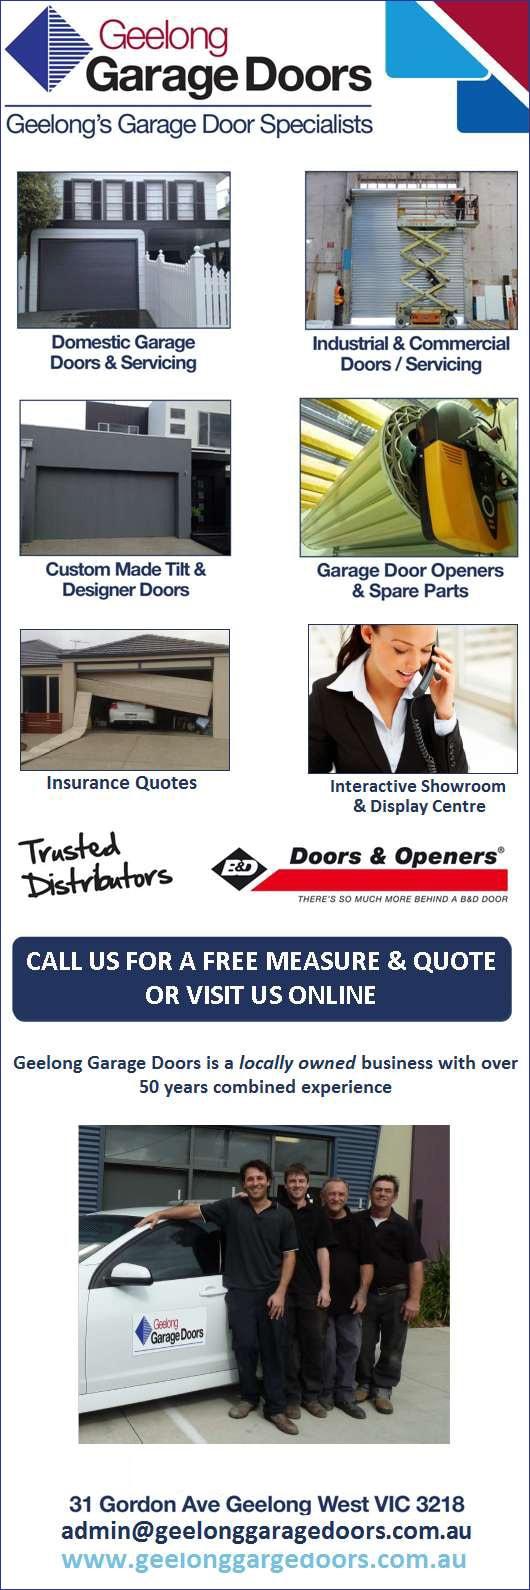 geelong garage doors roller shutters 31 33 gordon ave geelong garage doors promotion